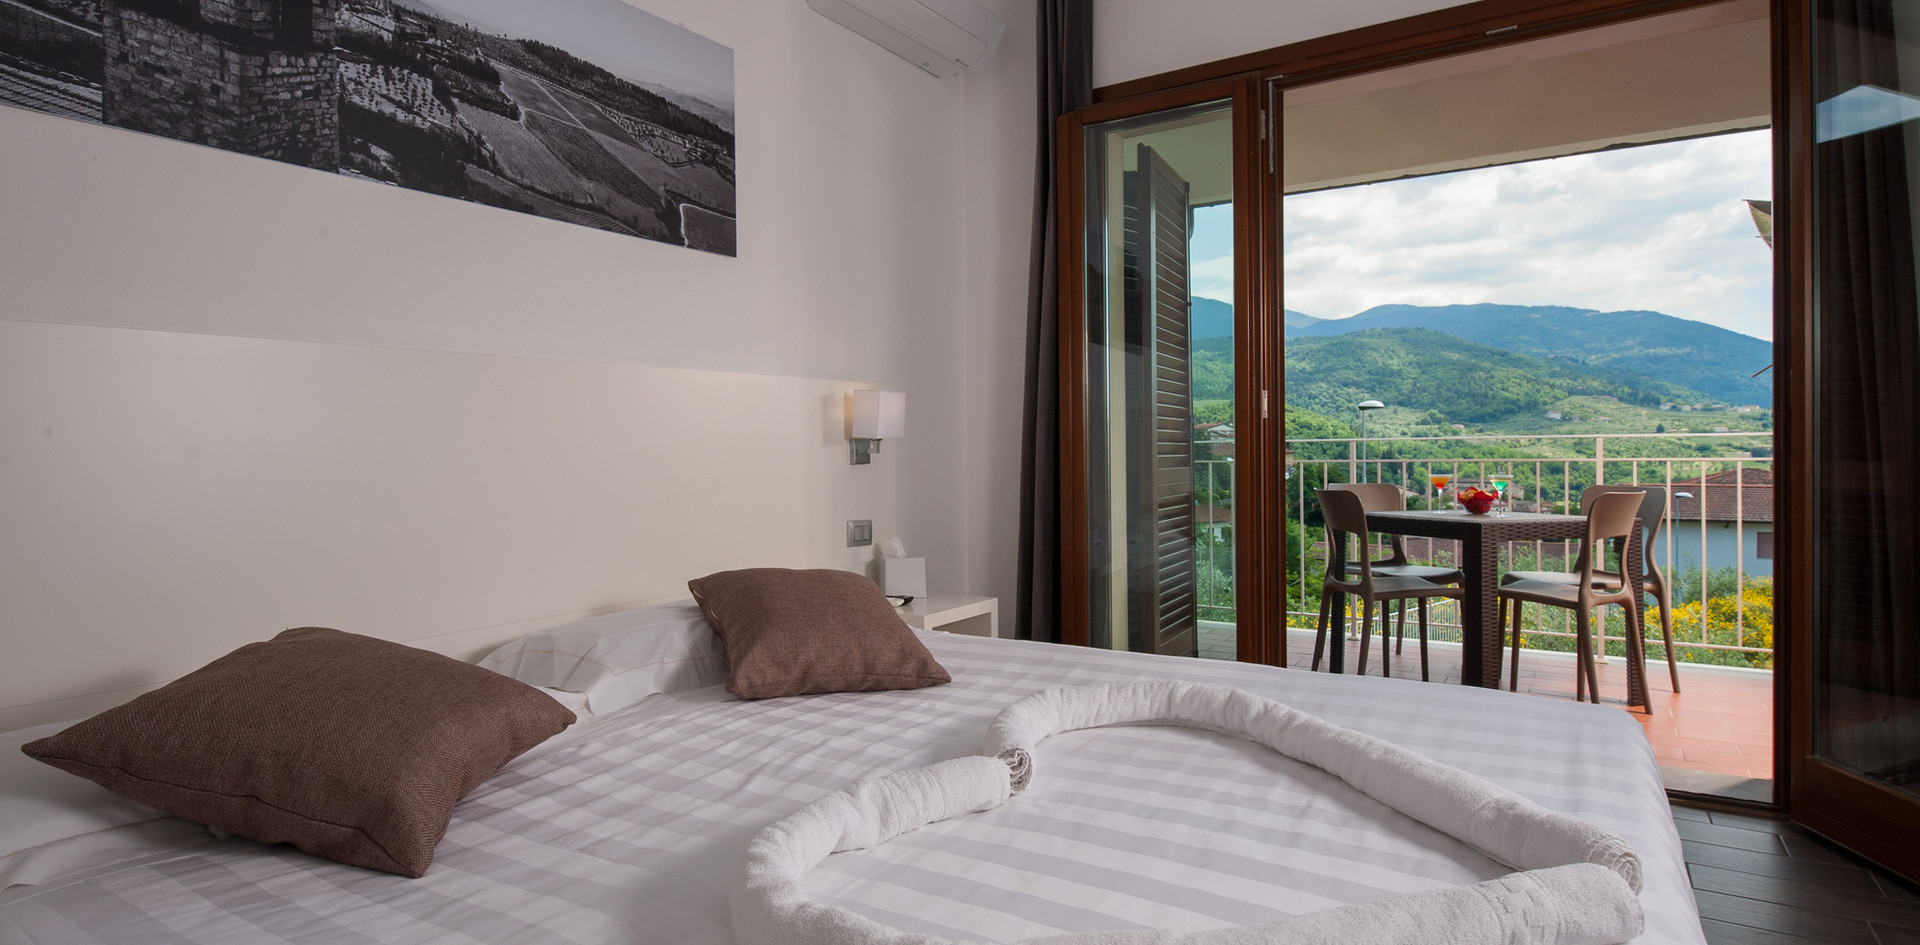 florence_hills_resort-1.jpg